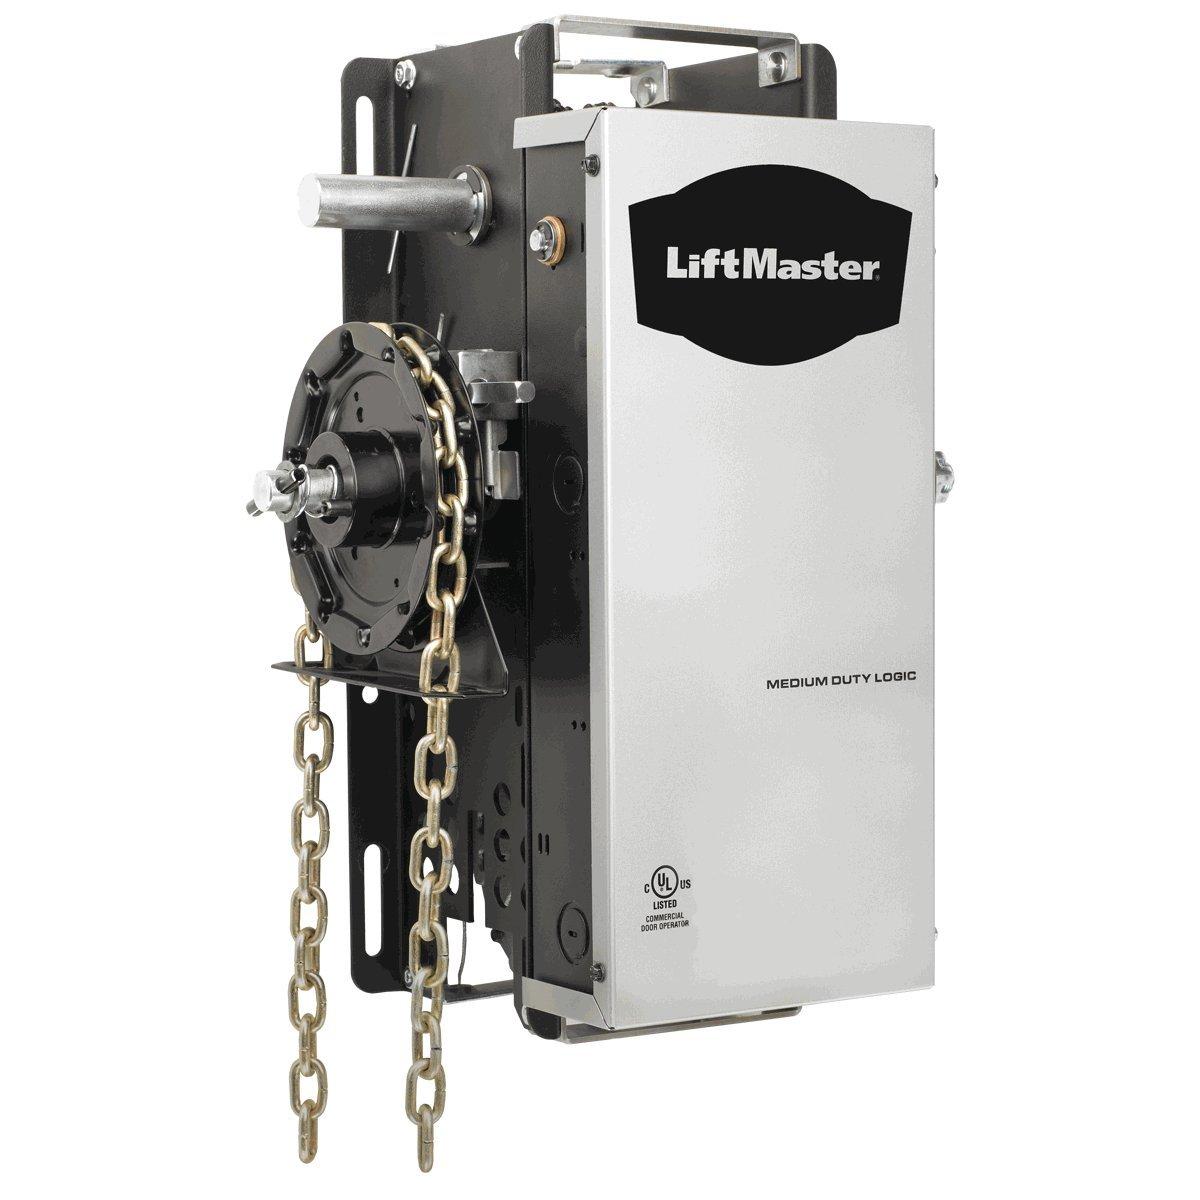 Liftmaster Mh 5011u Commercial Garage Door Opener Medium-duty Hoist Operator w/ Safety Beams